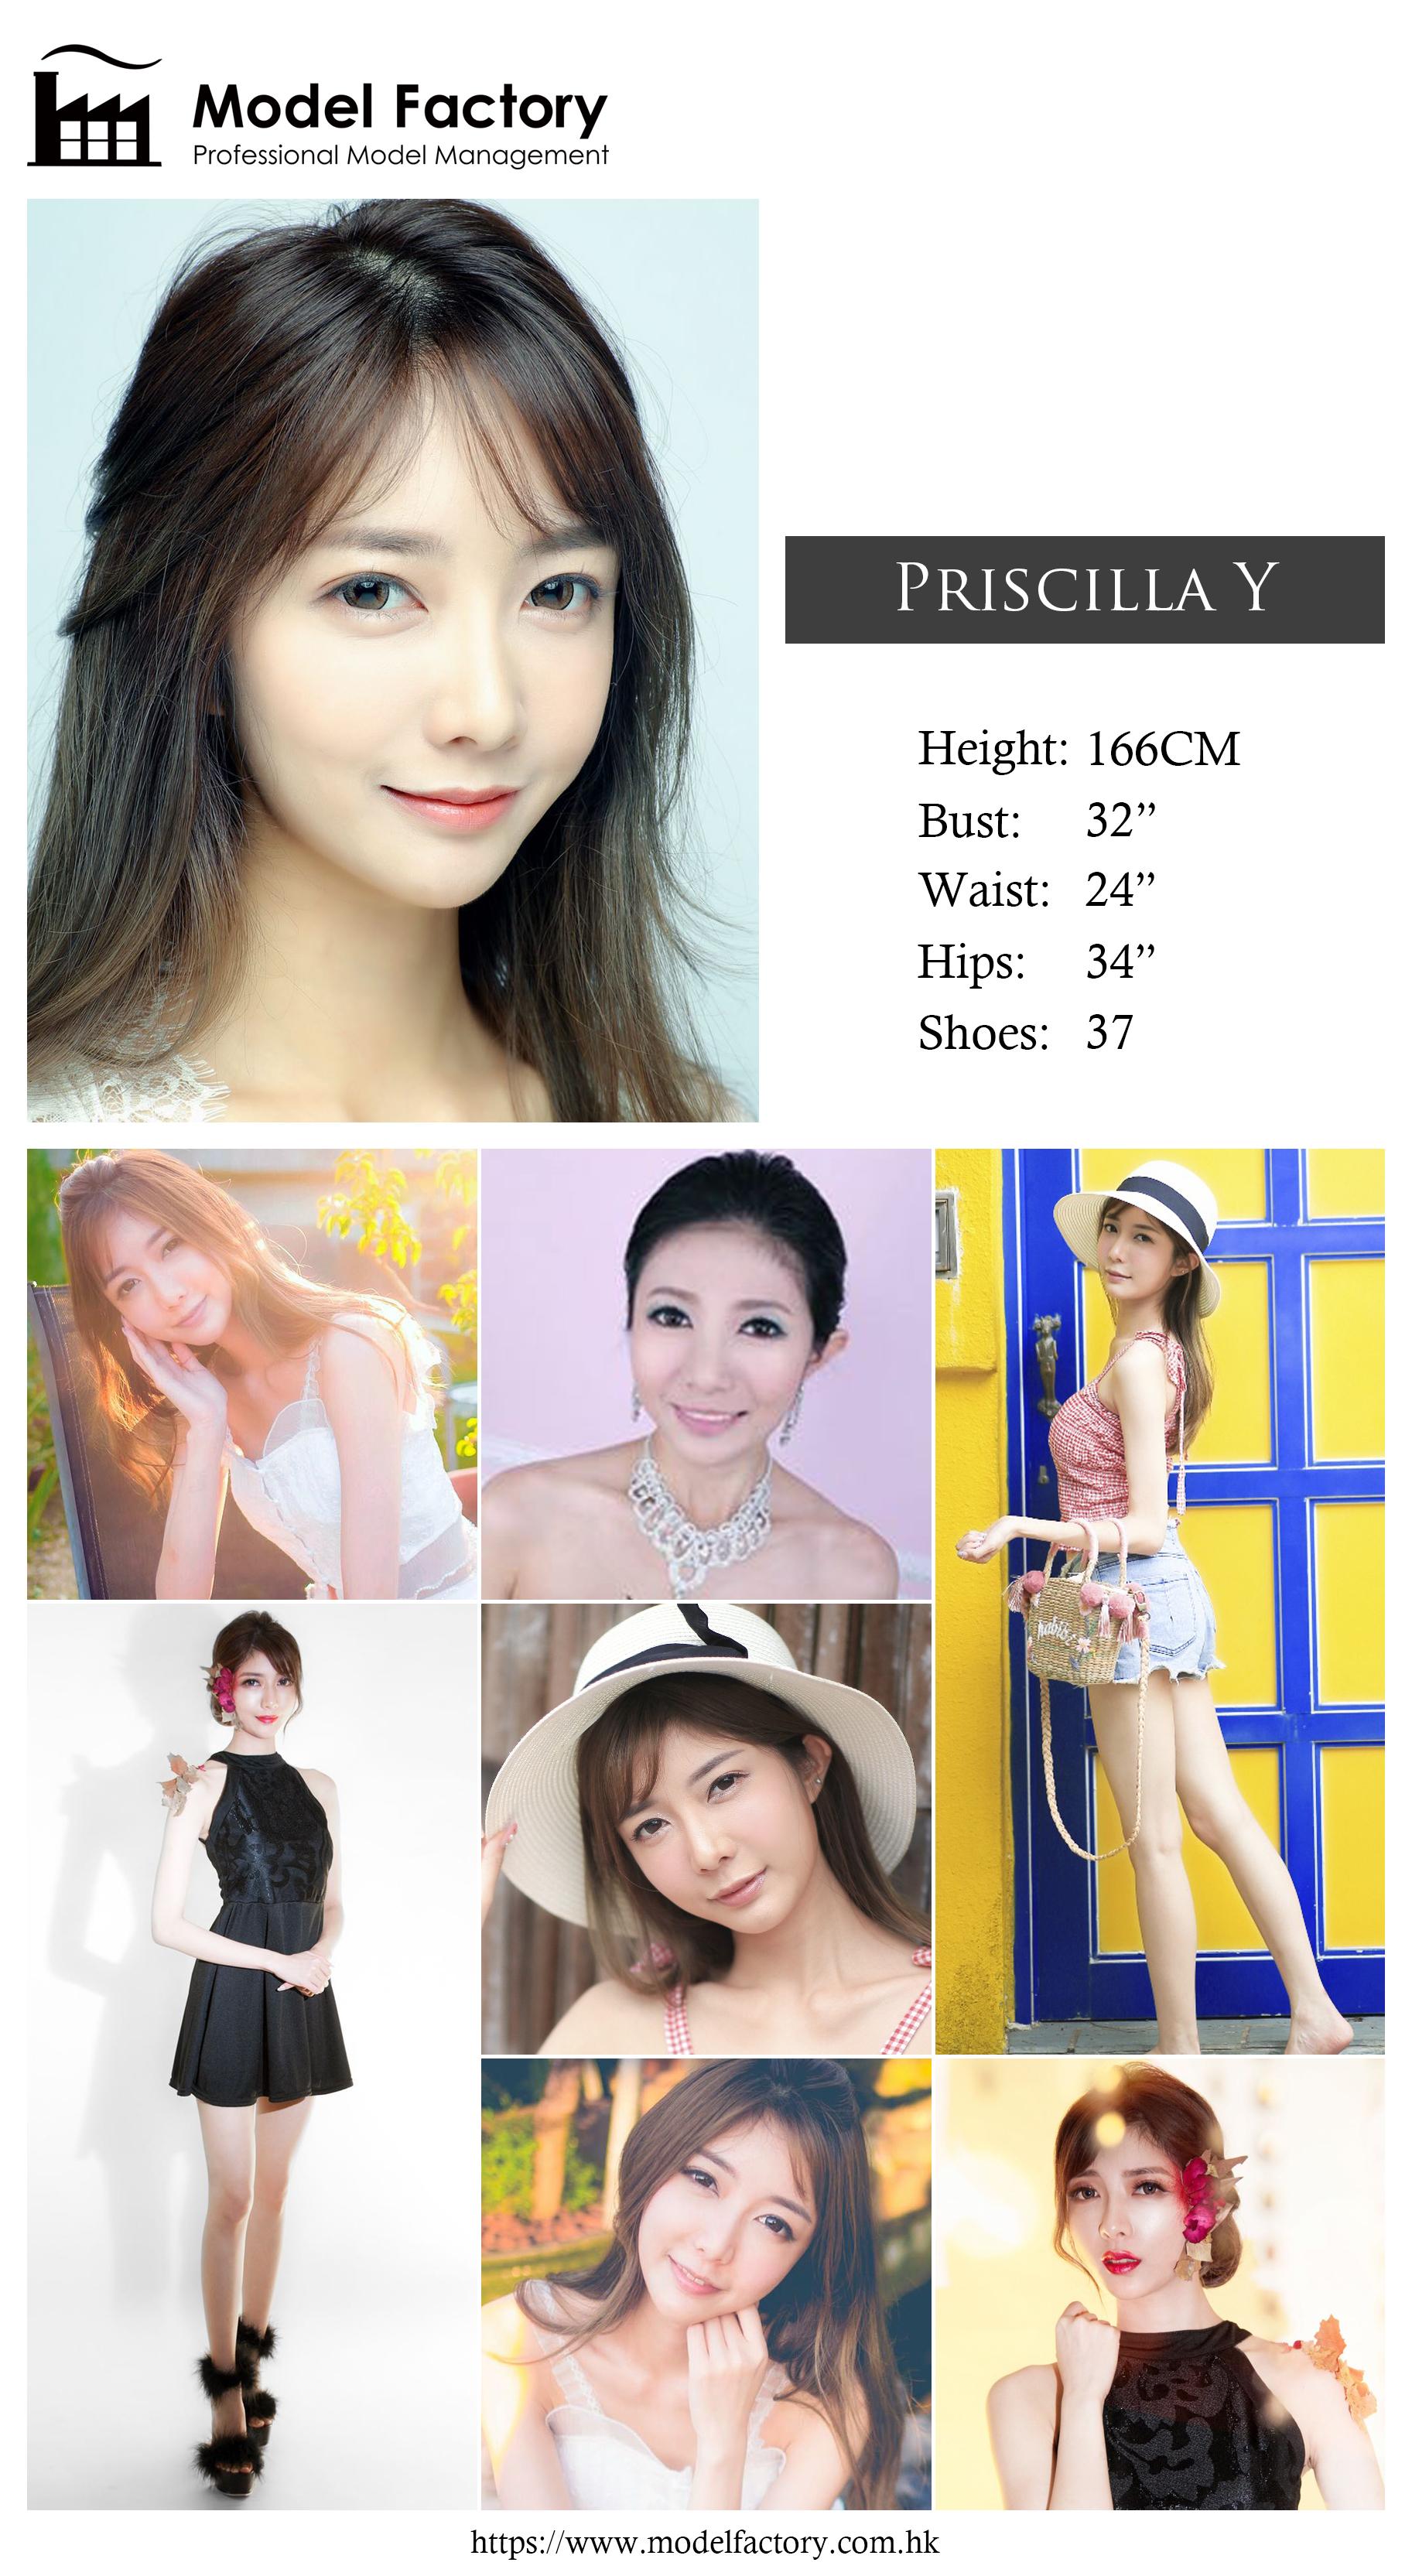 Model Factory Hong Kong Female Model PriscillaY